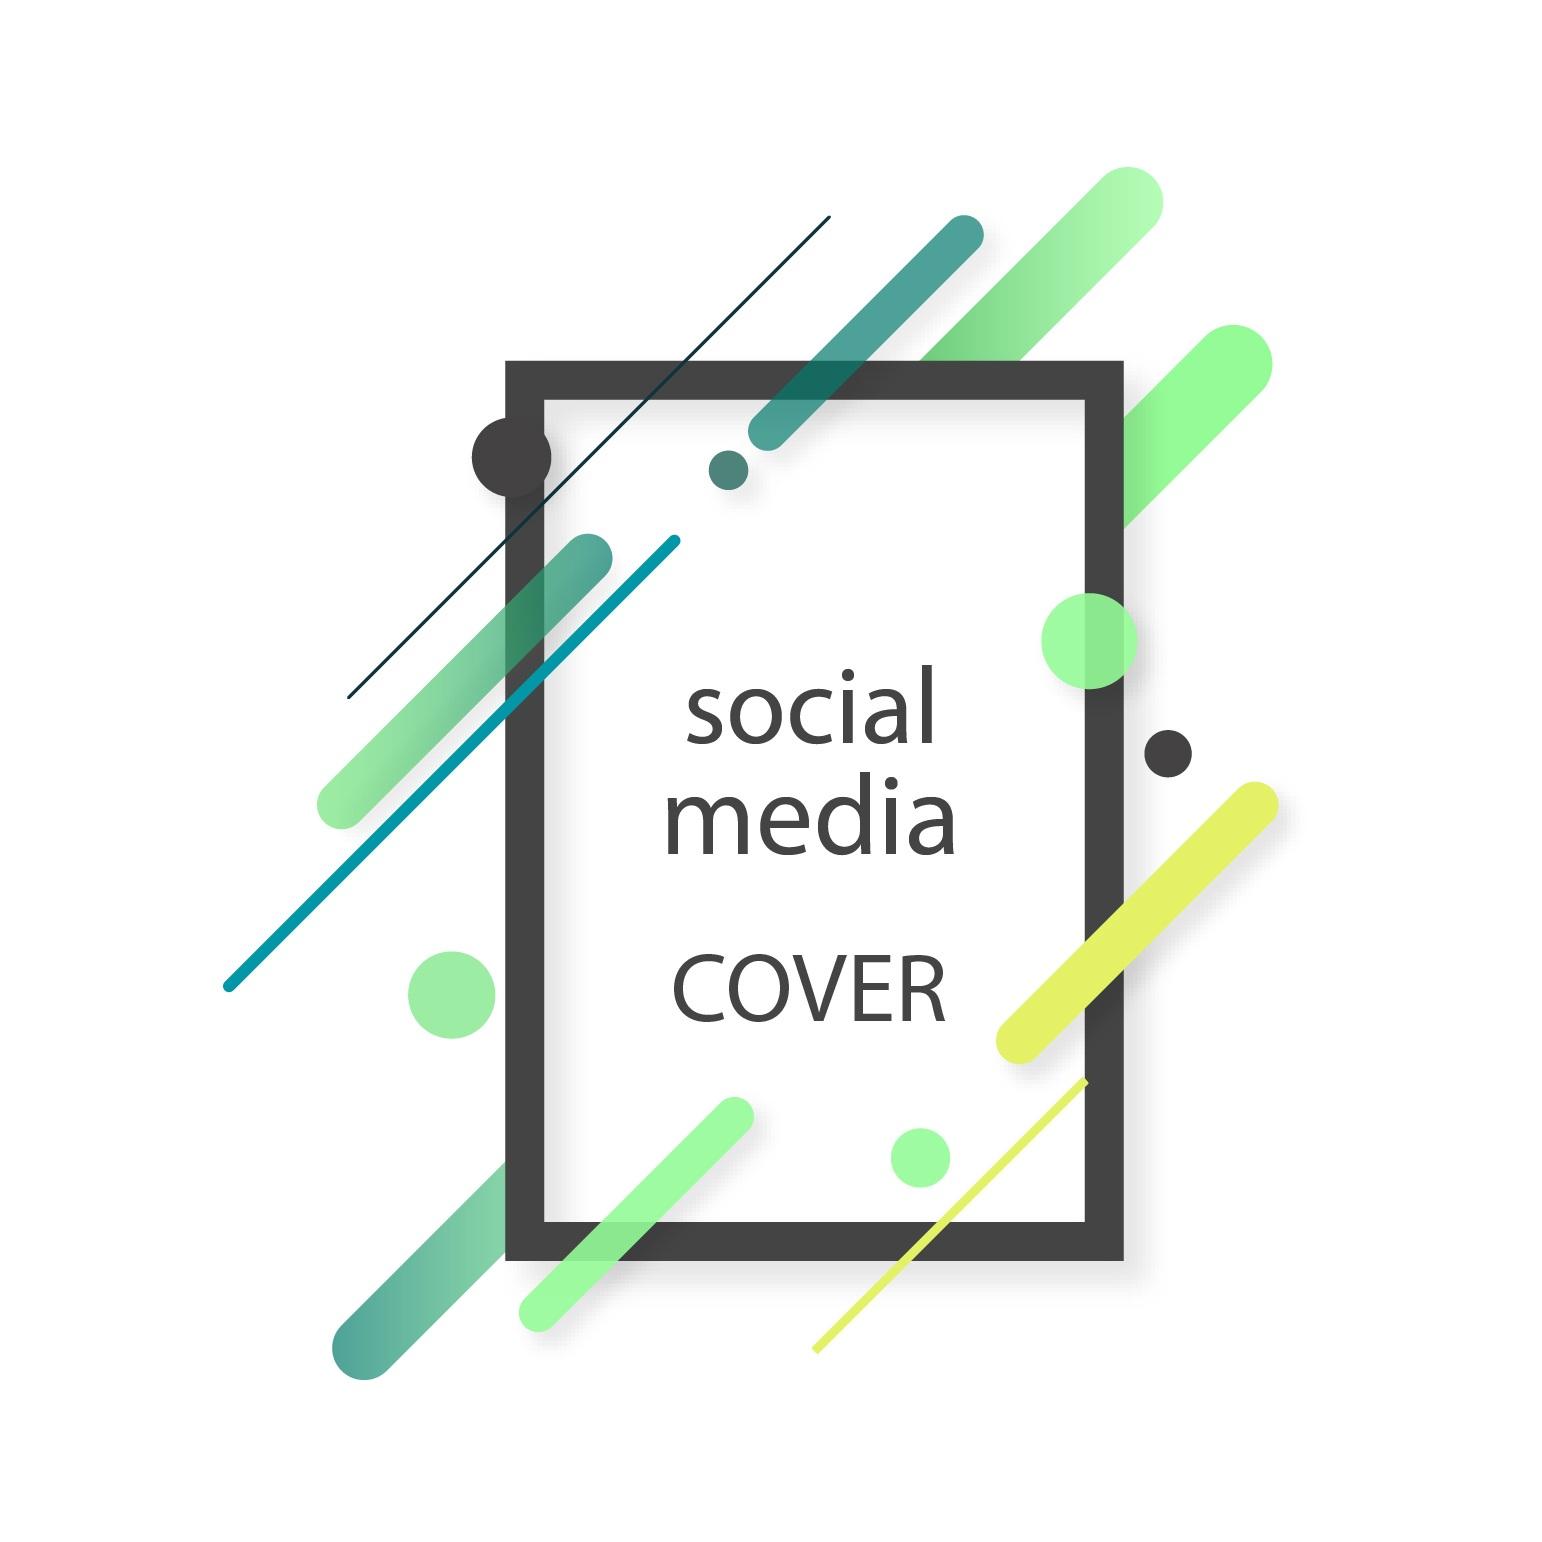 social media cover design-01